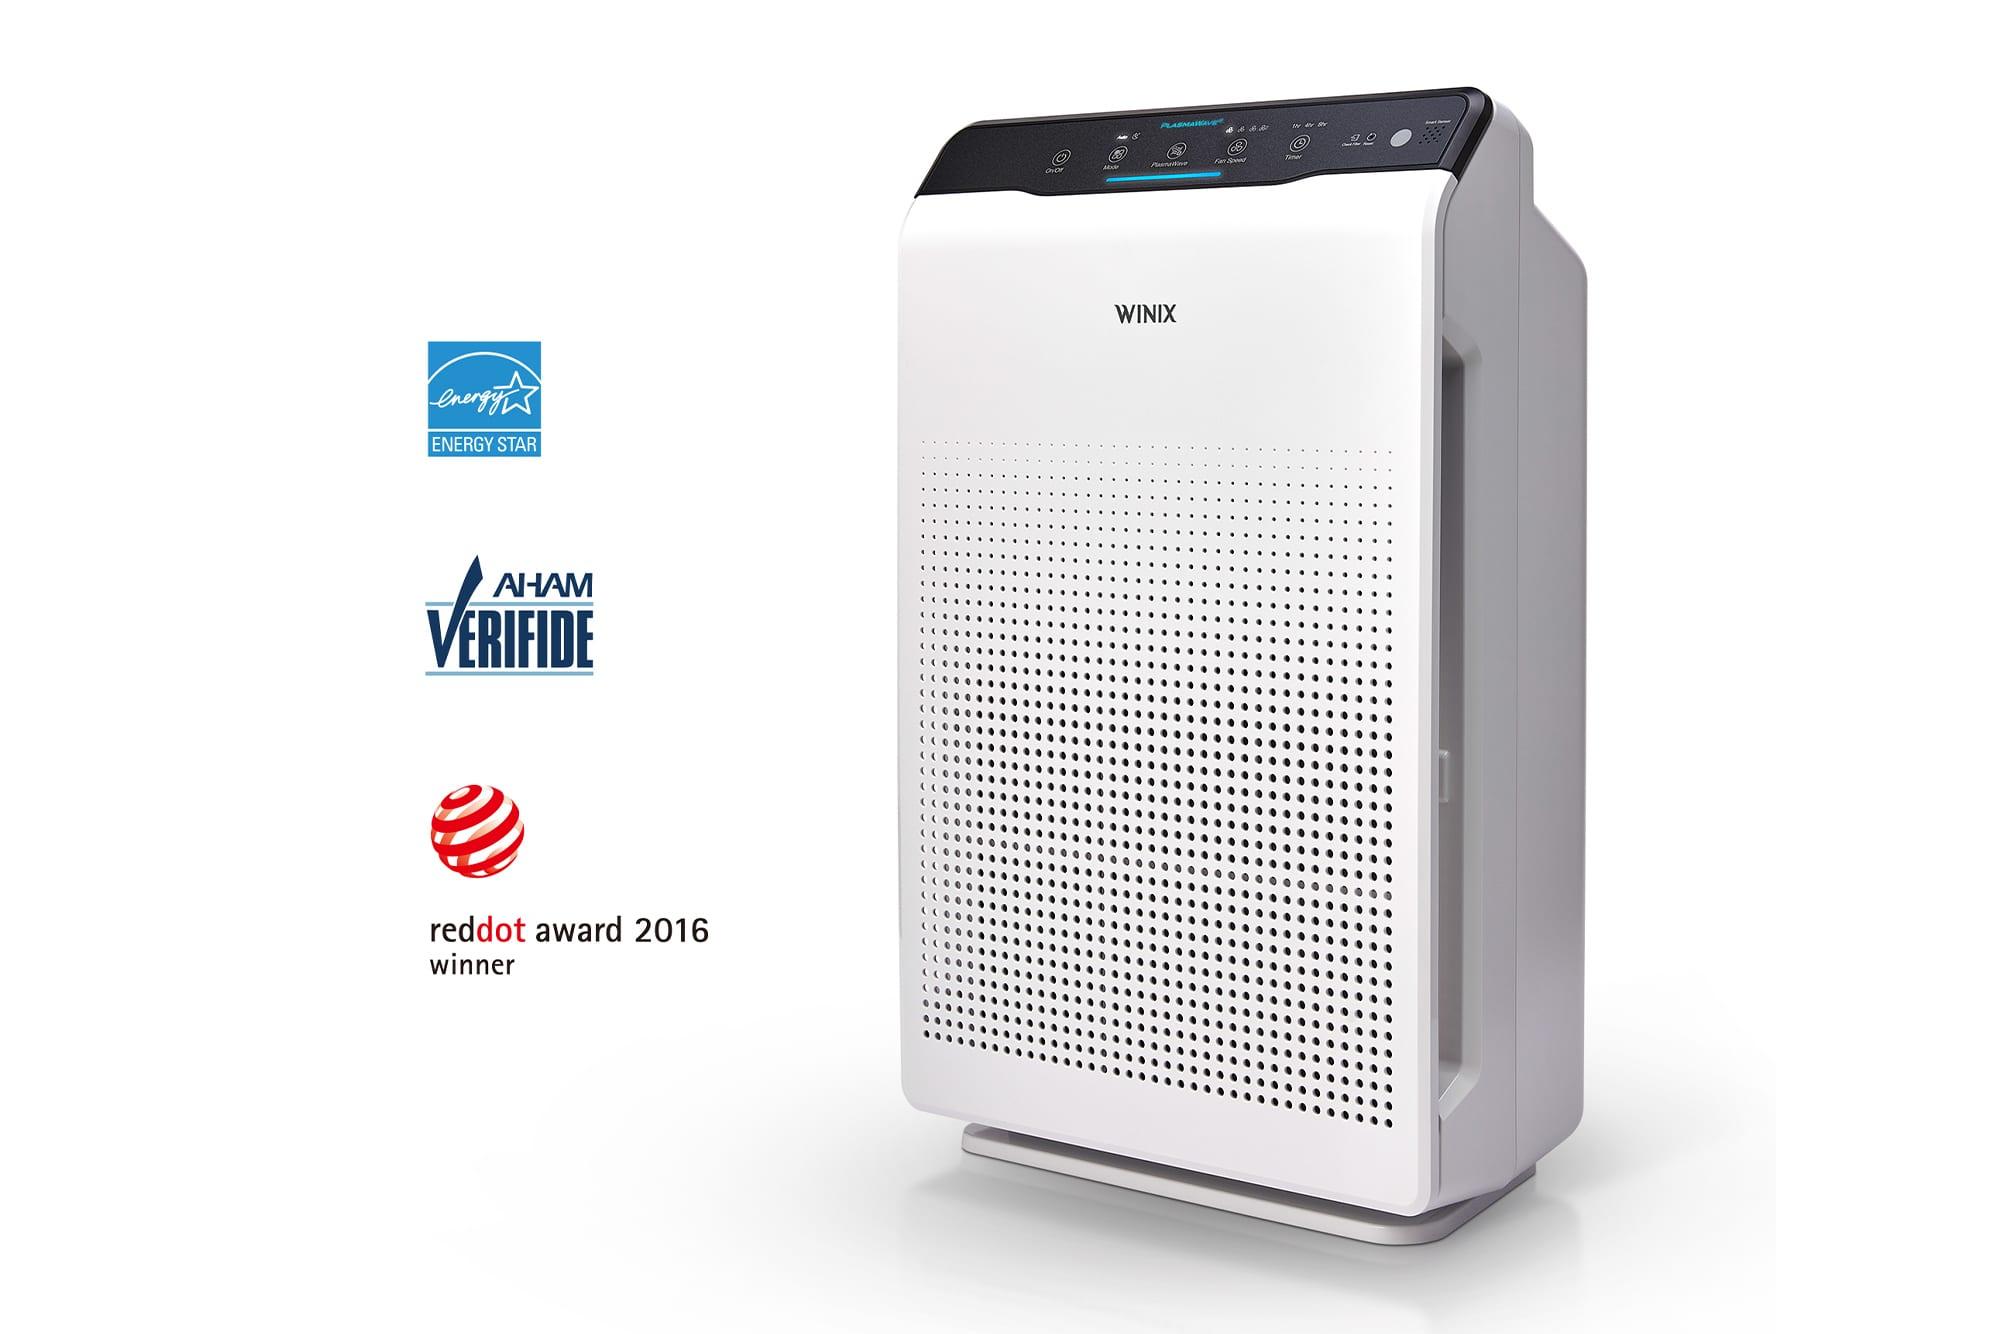 Winix C535 Air Purifier w/ PlasmaWave Technology (Certified Refurbished) $80.99 AC + FREE Shipping